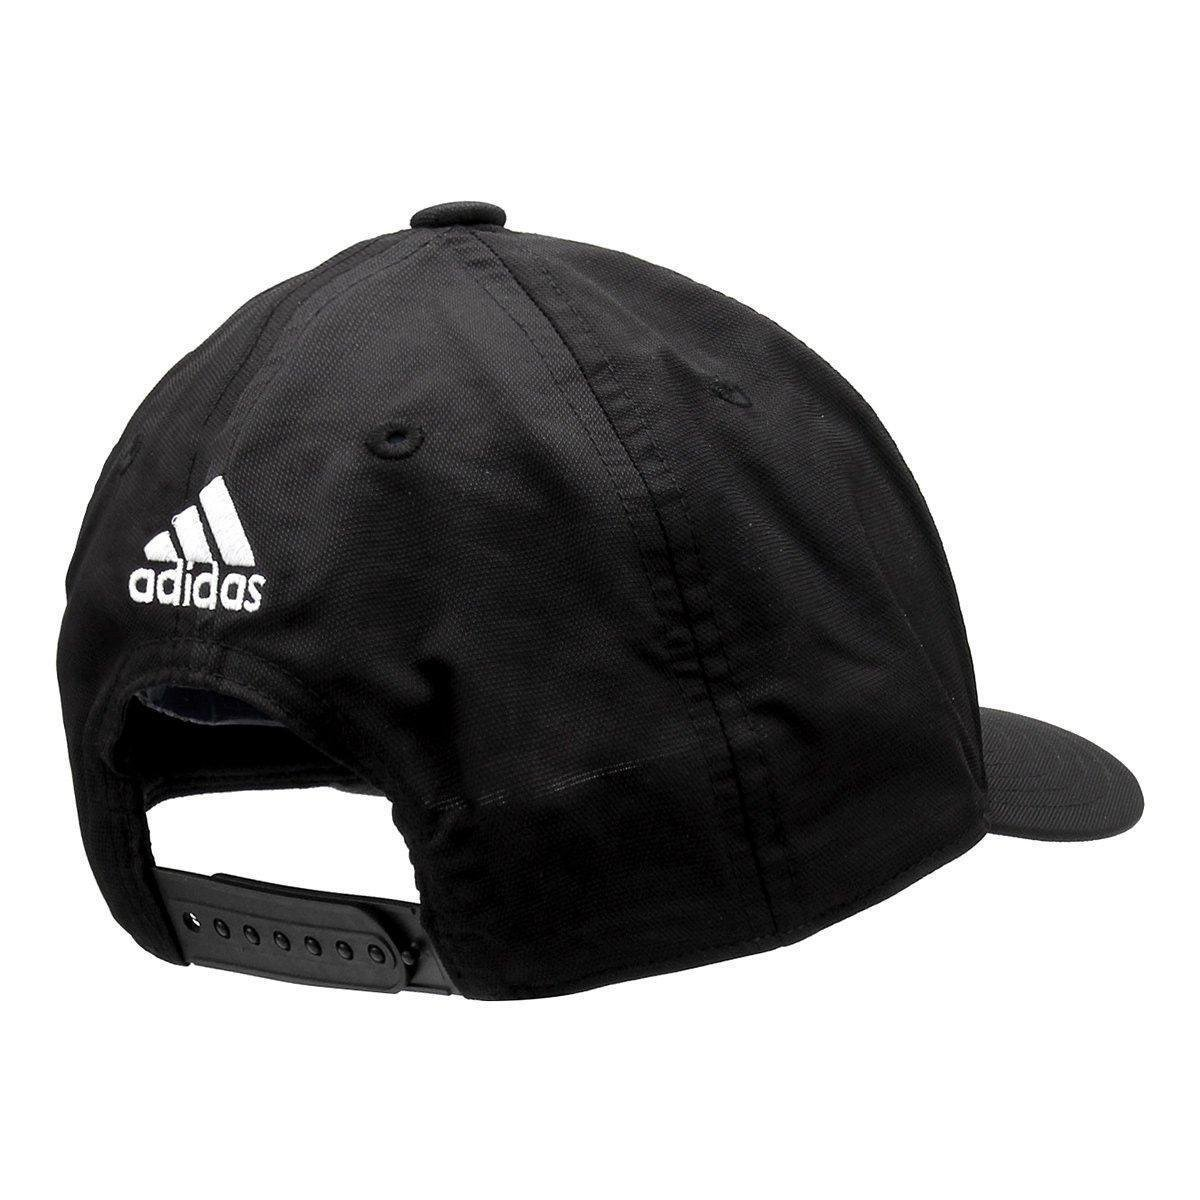 093a8ba4f1 Boné Adidas Juventus CW Aba Curva